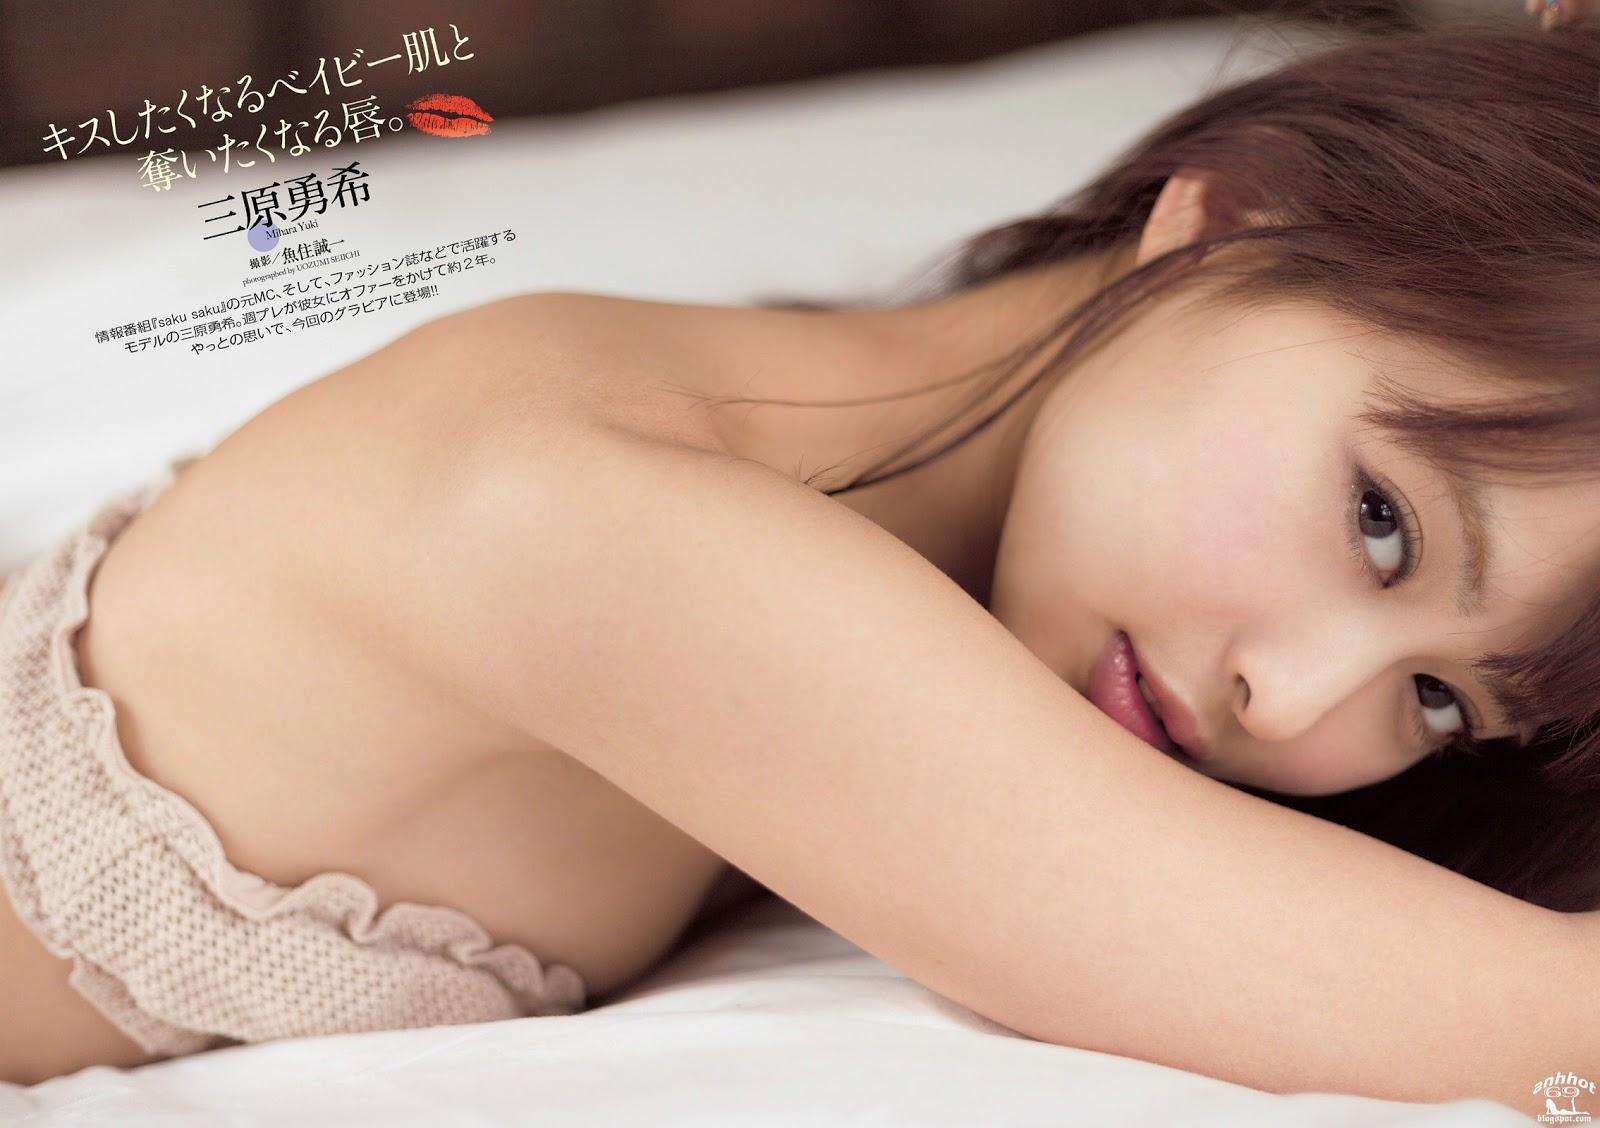 yuuki-mihara-02699849